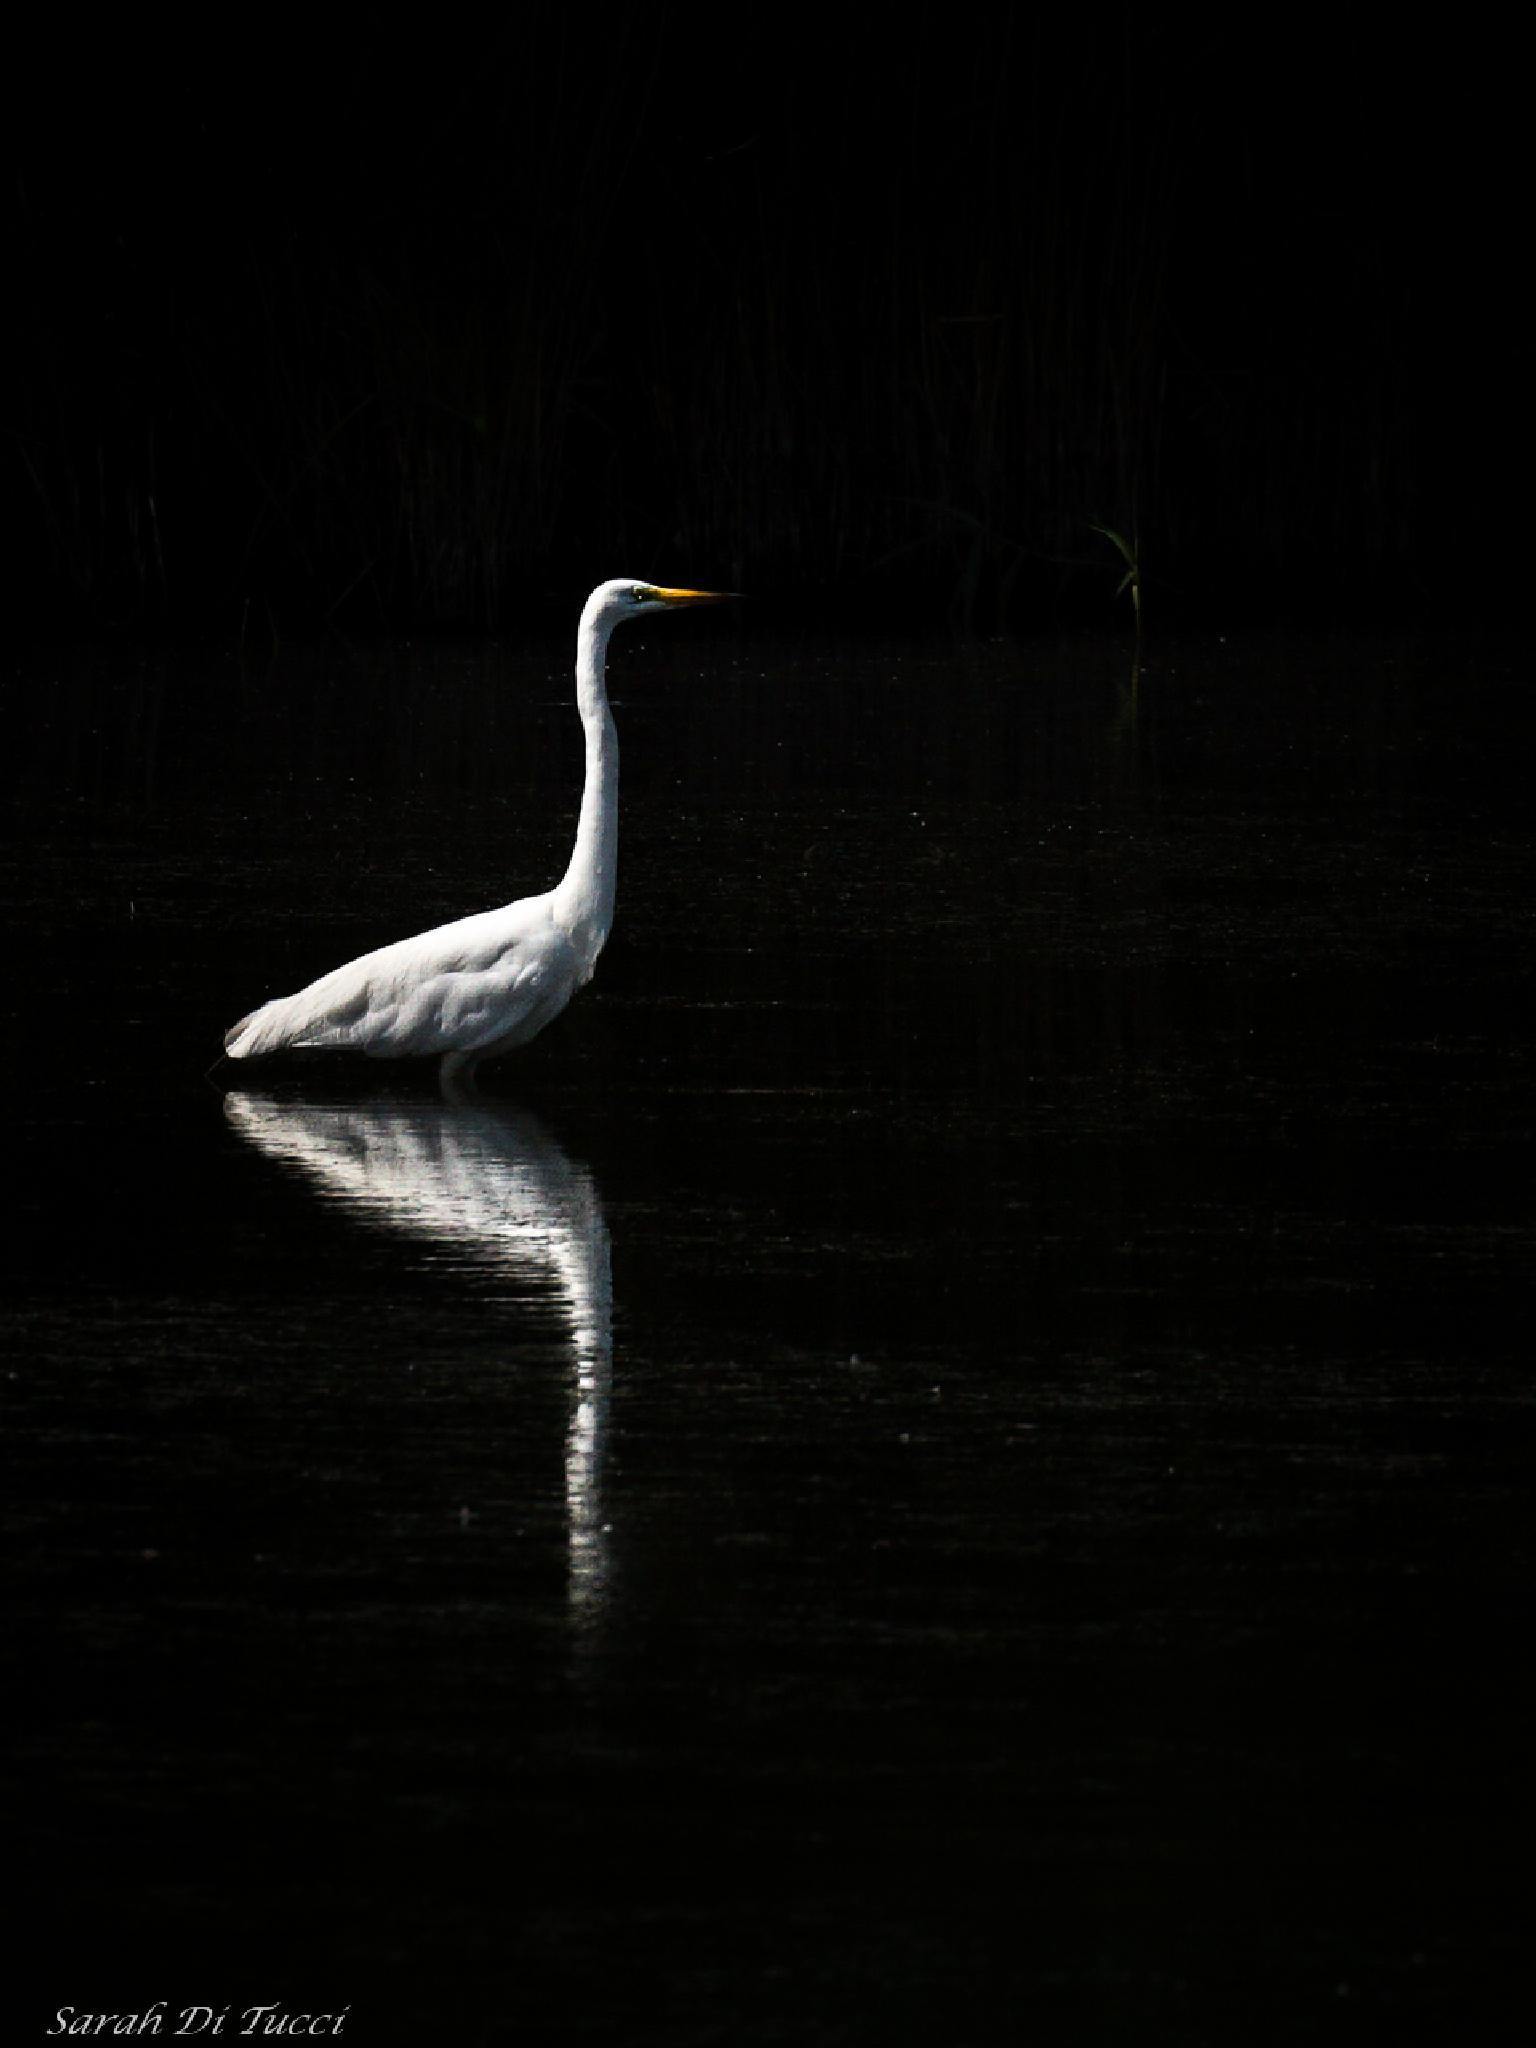 White heron by Sarah Di Tucci